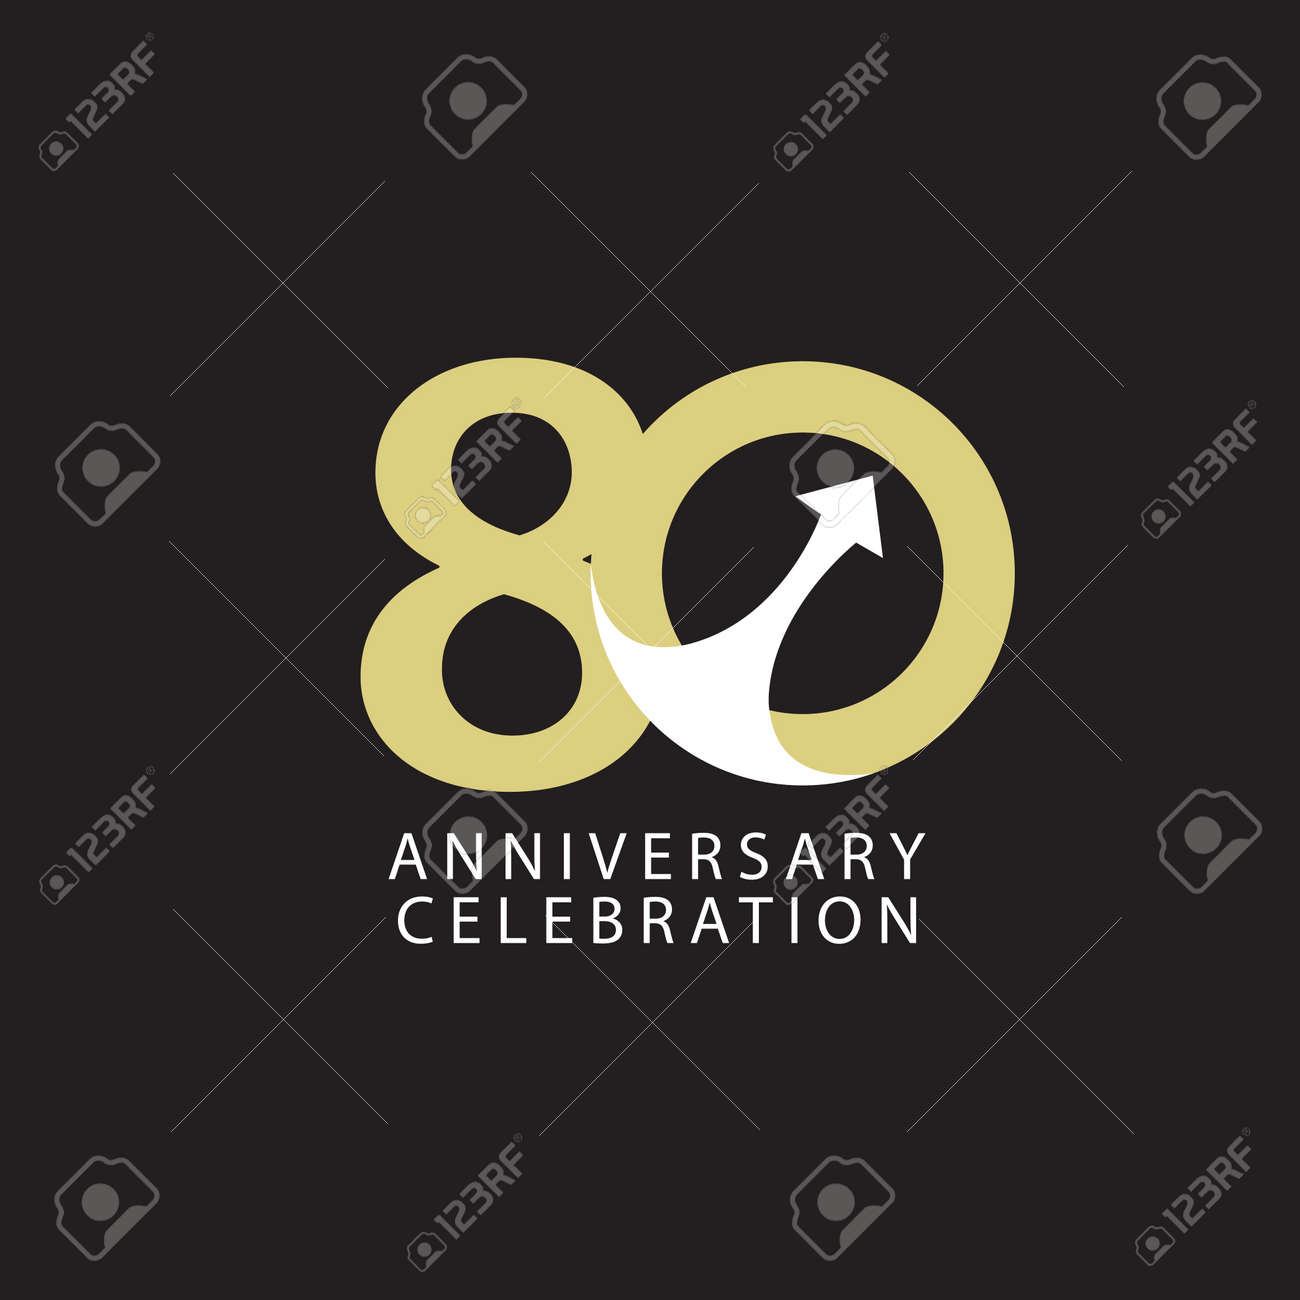 80 Years Anniversary Celebration Vector Template Design Illustration - 163698079